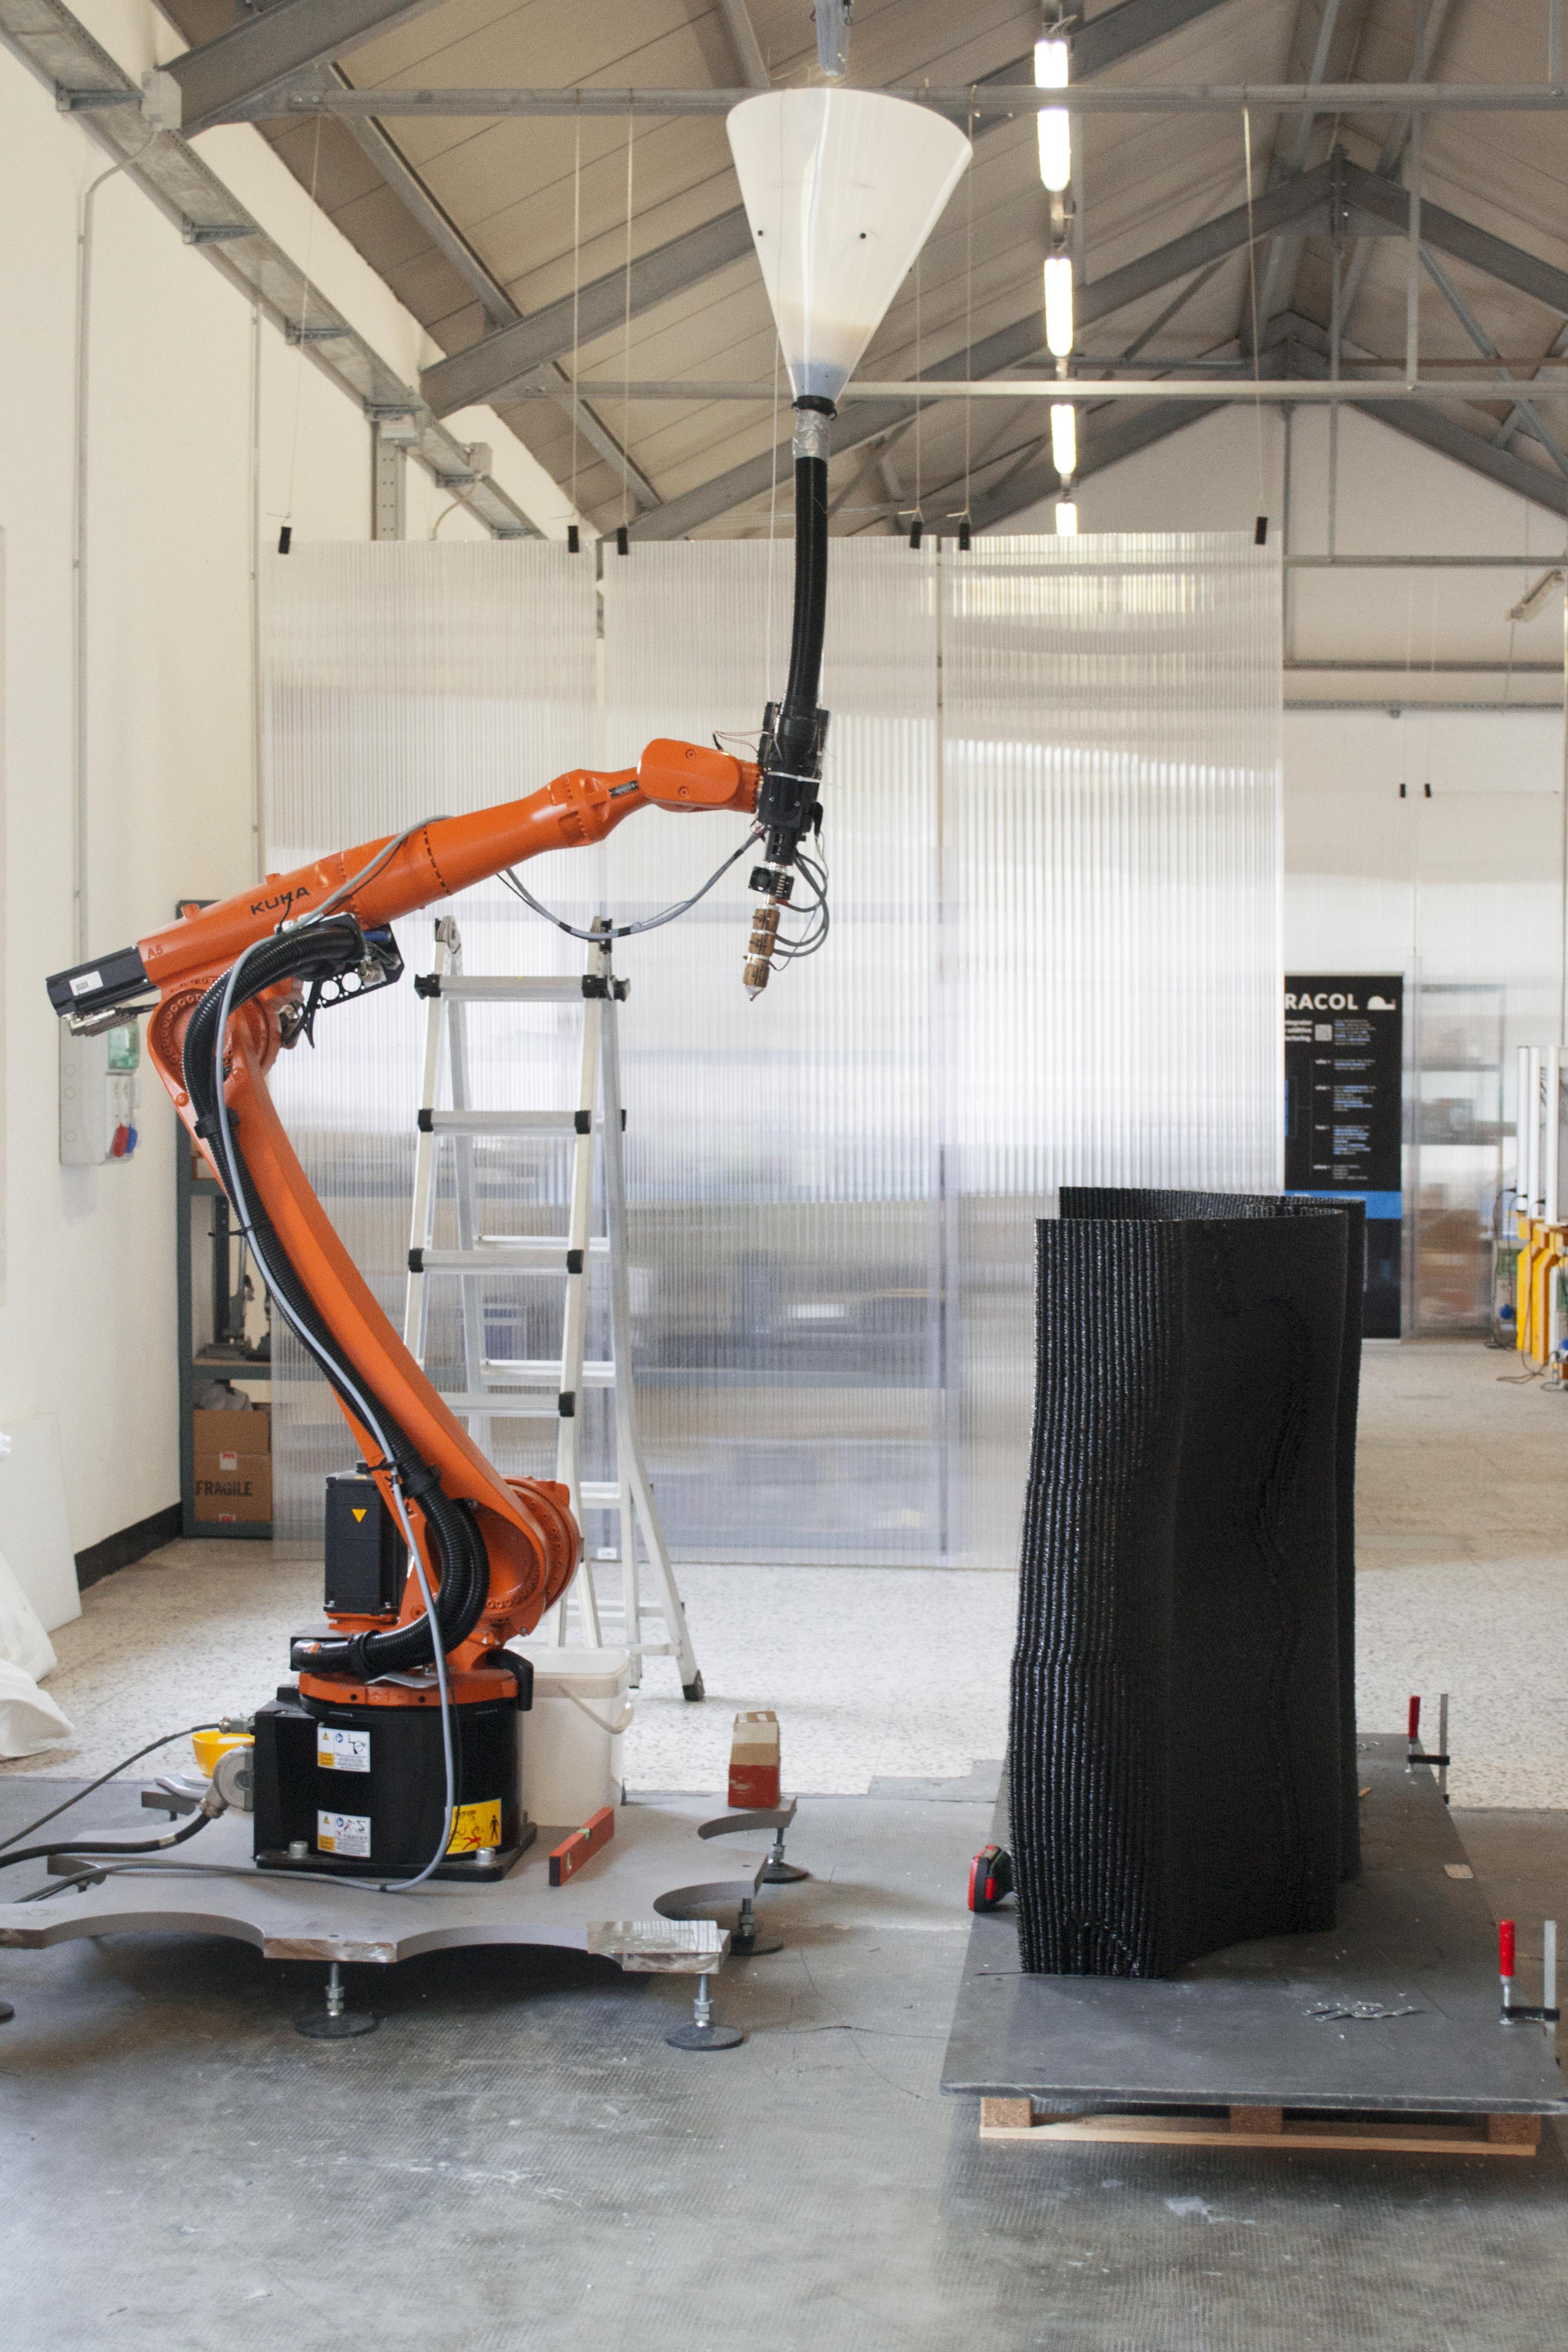 Caracol Robotic AM Tecnology